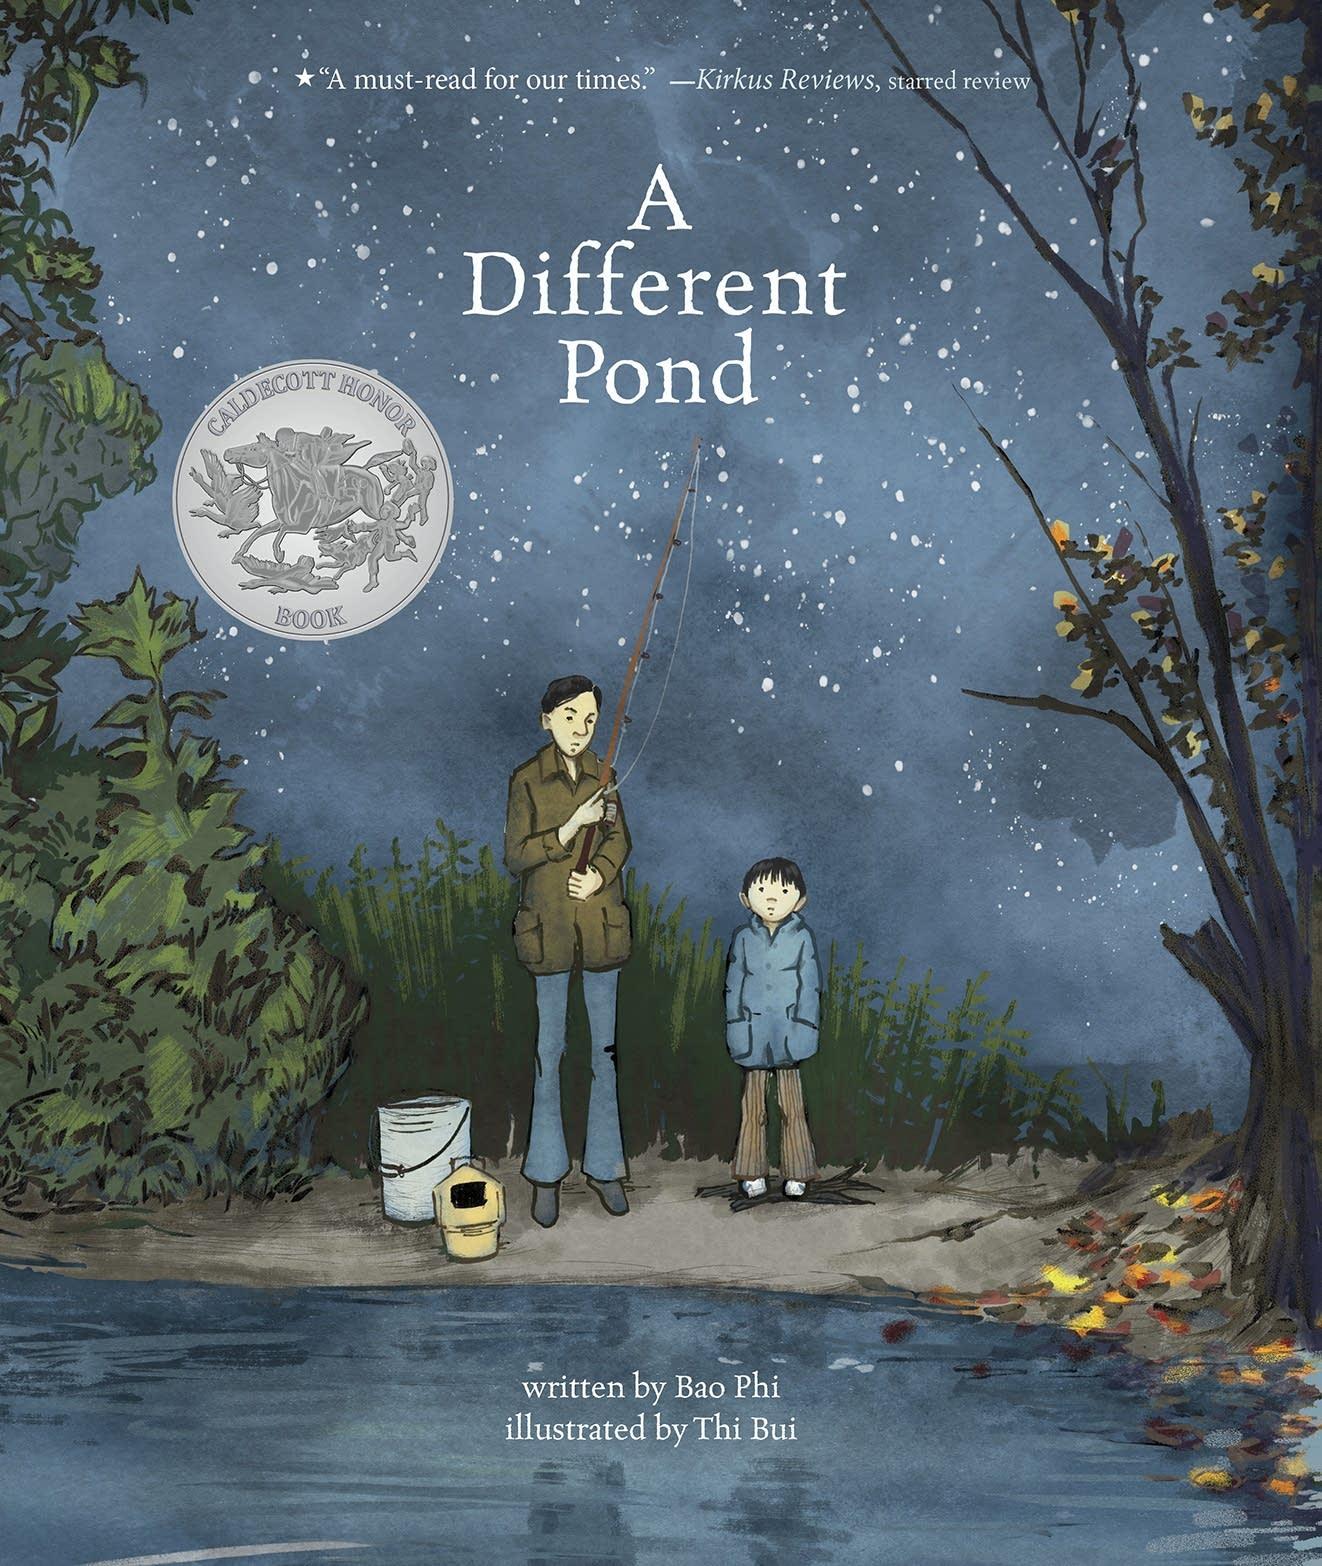 The award-winning children's book,